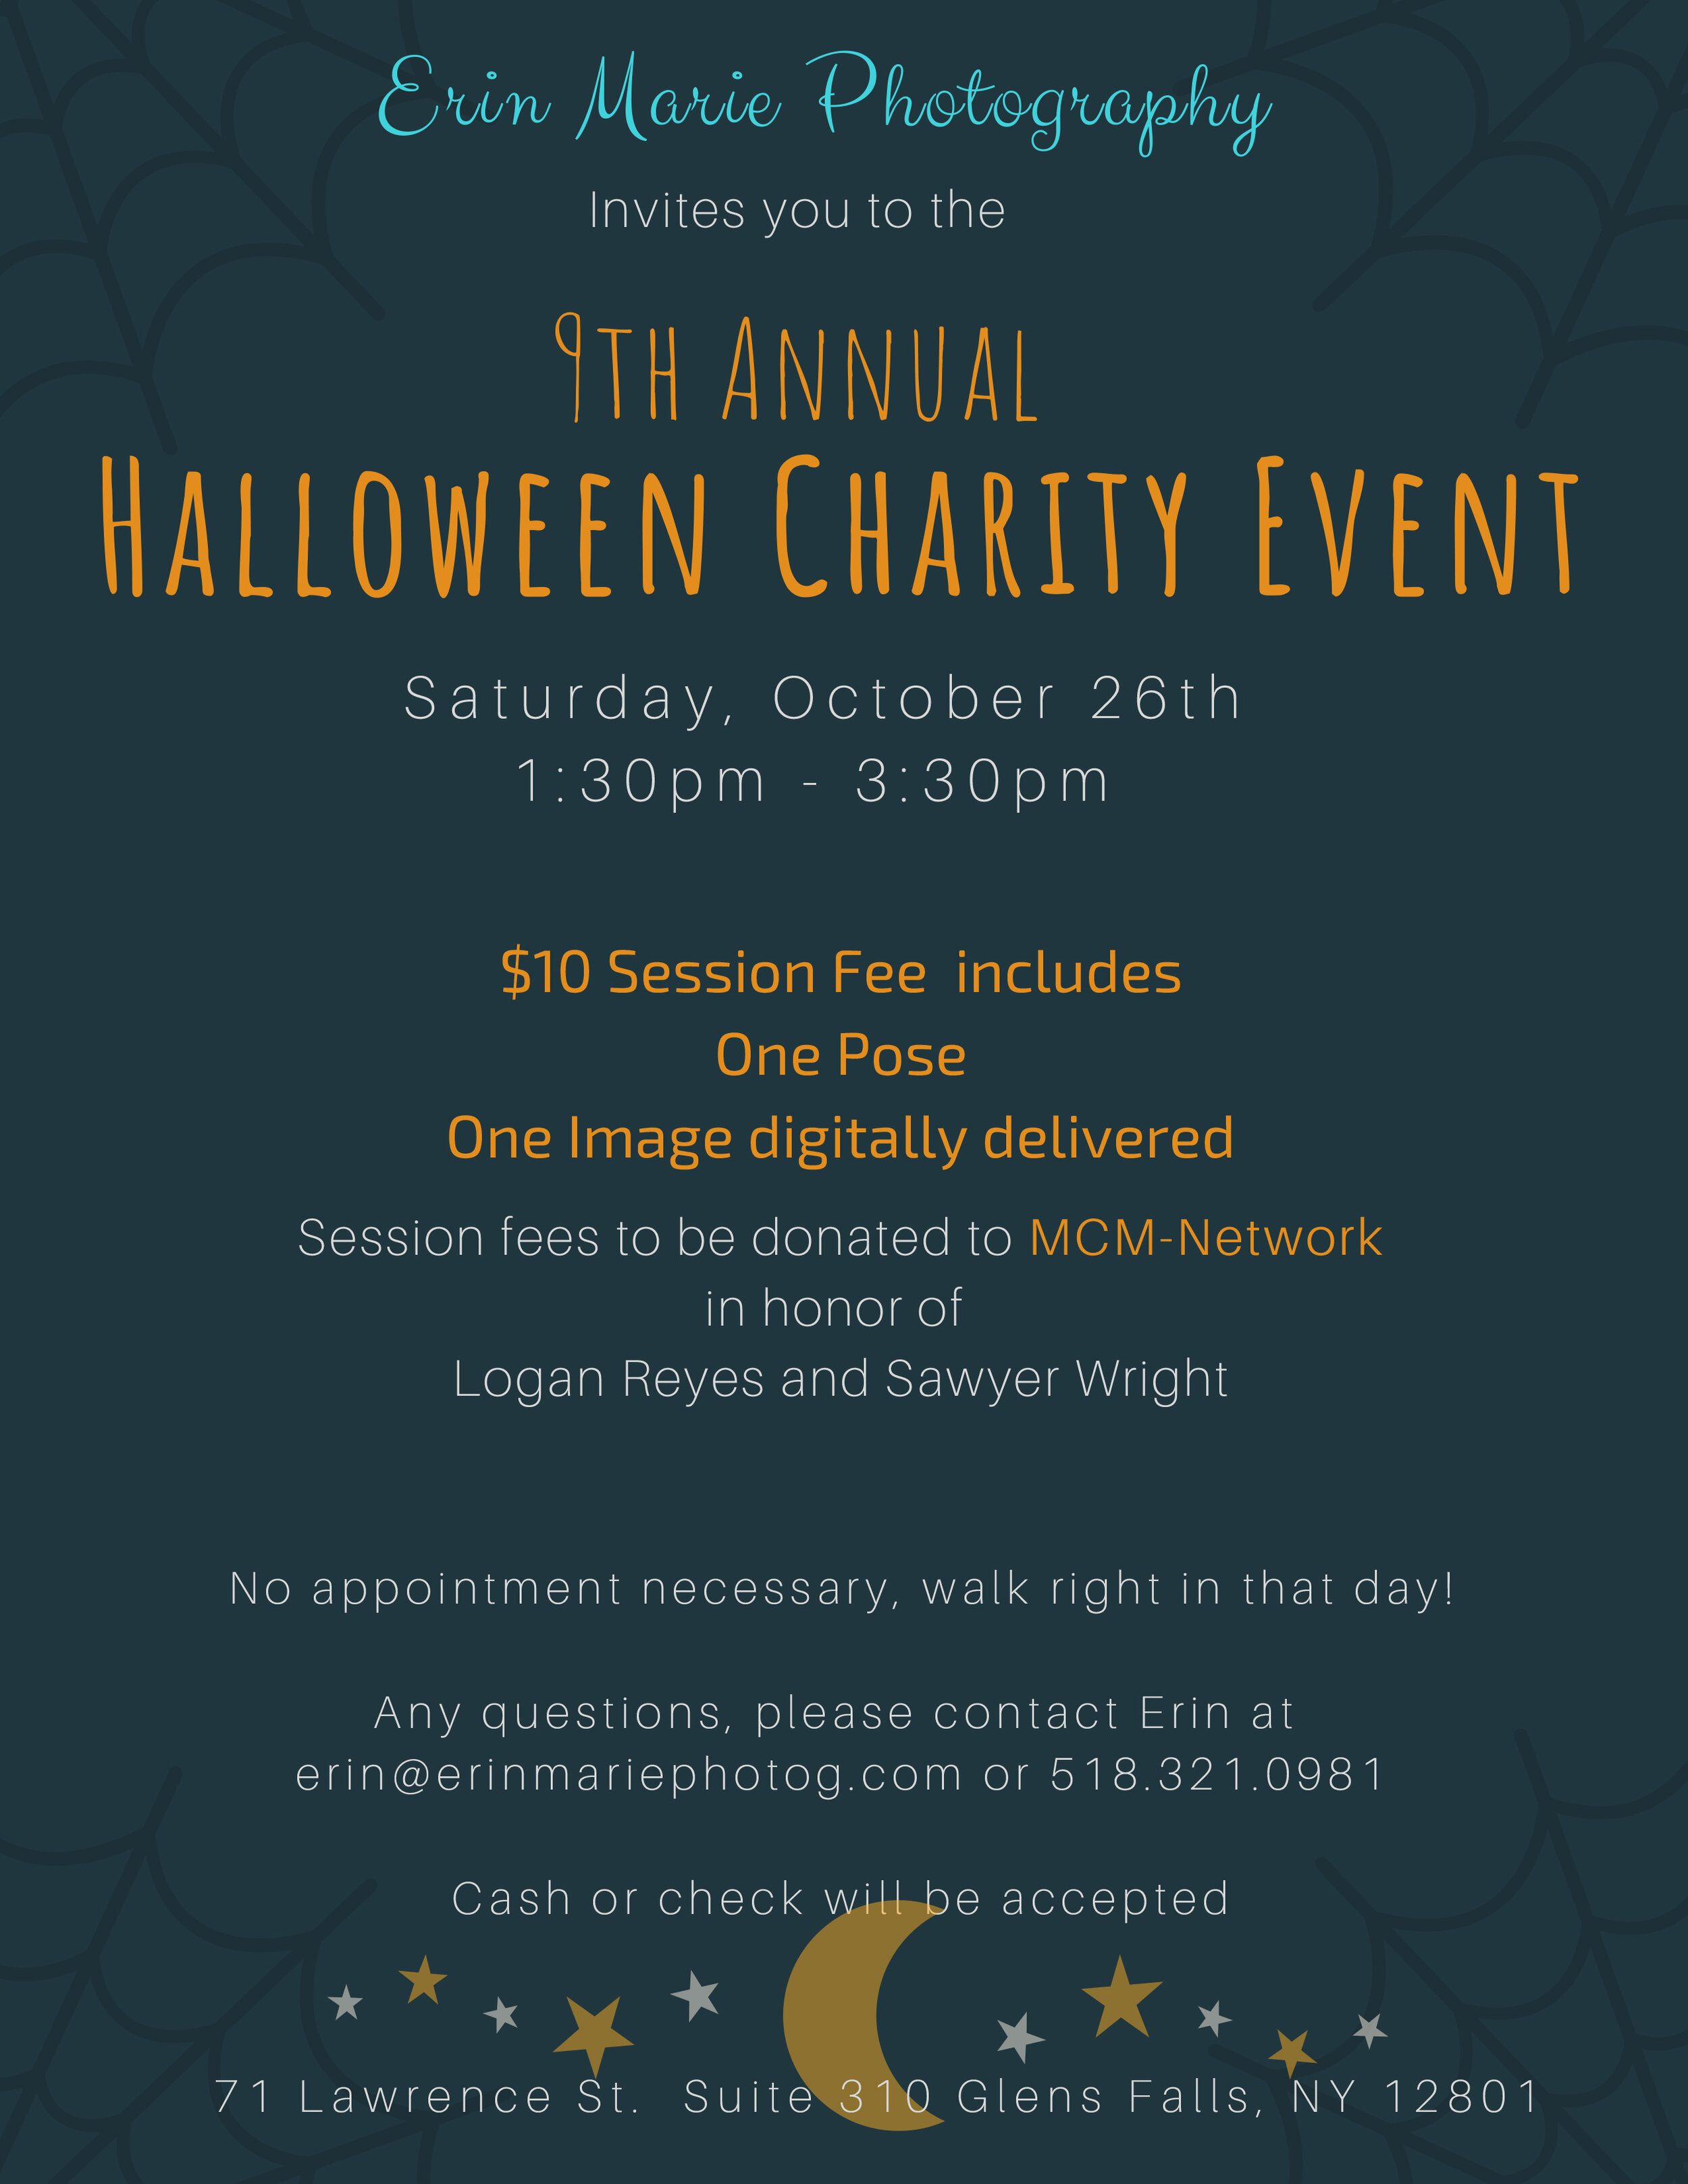 Halloween _charity_Event_2019.jpg